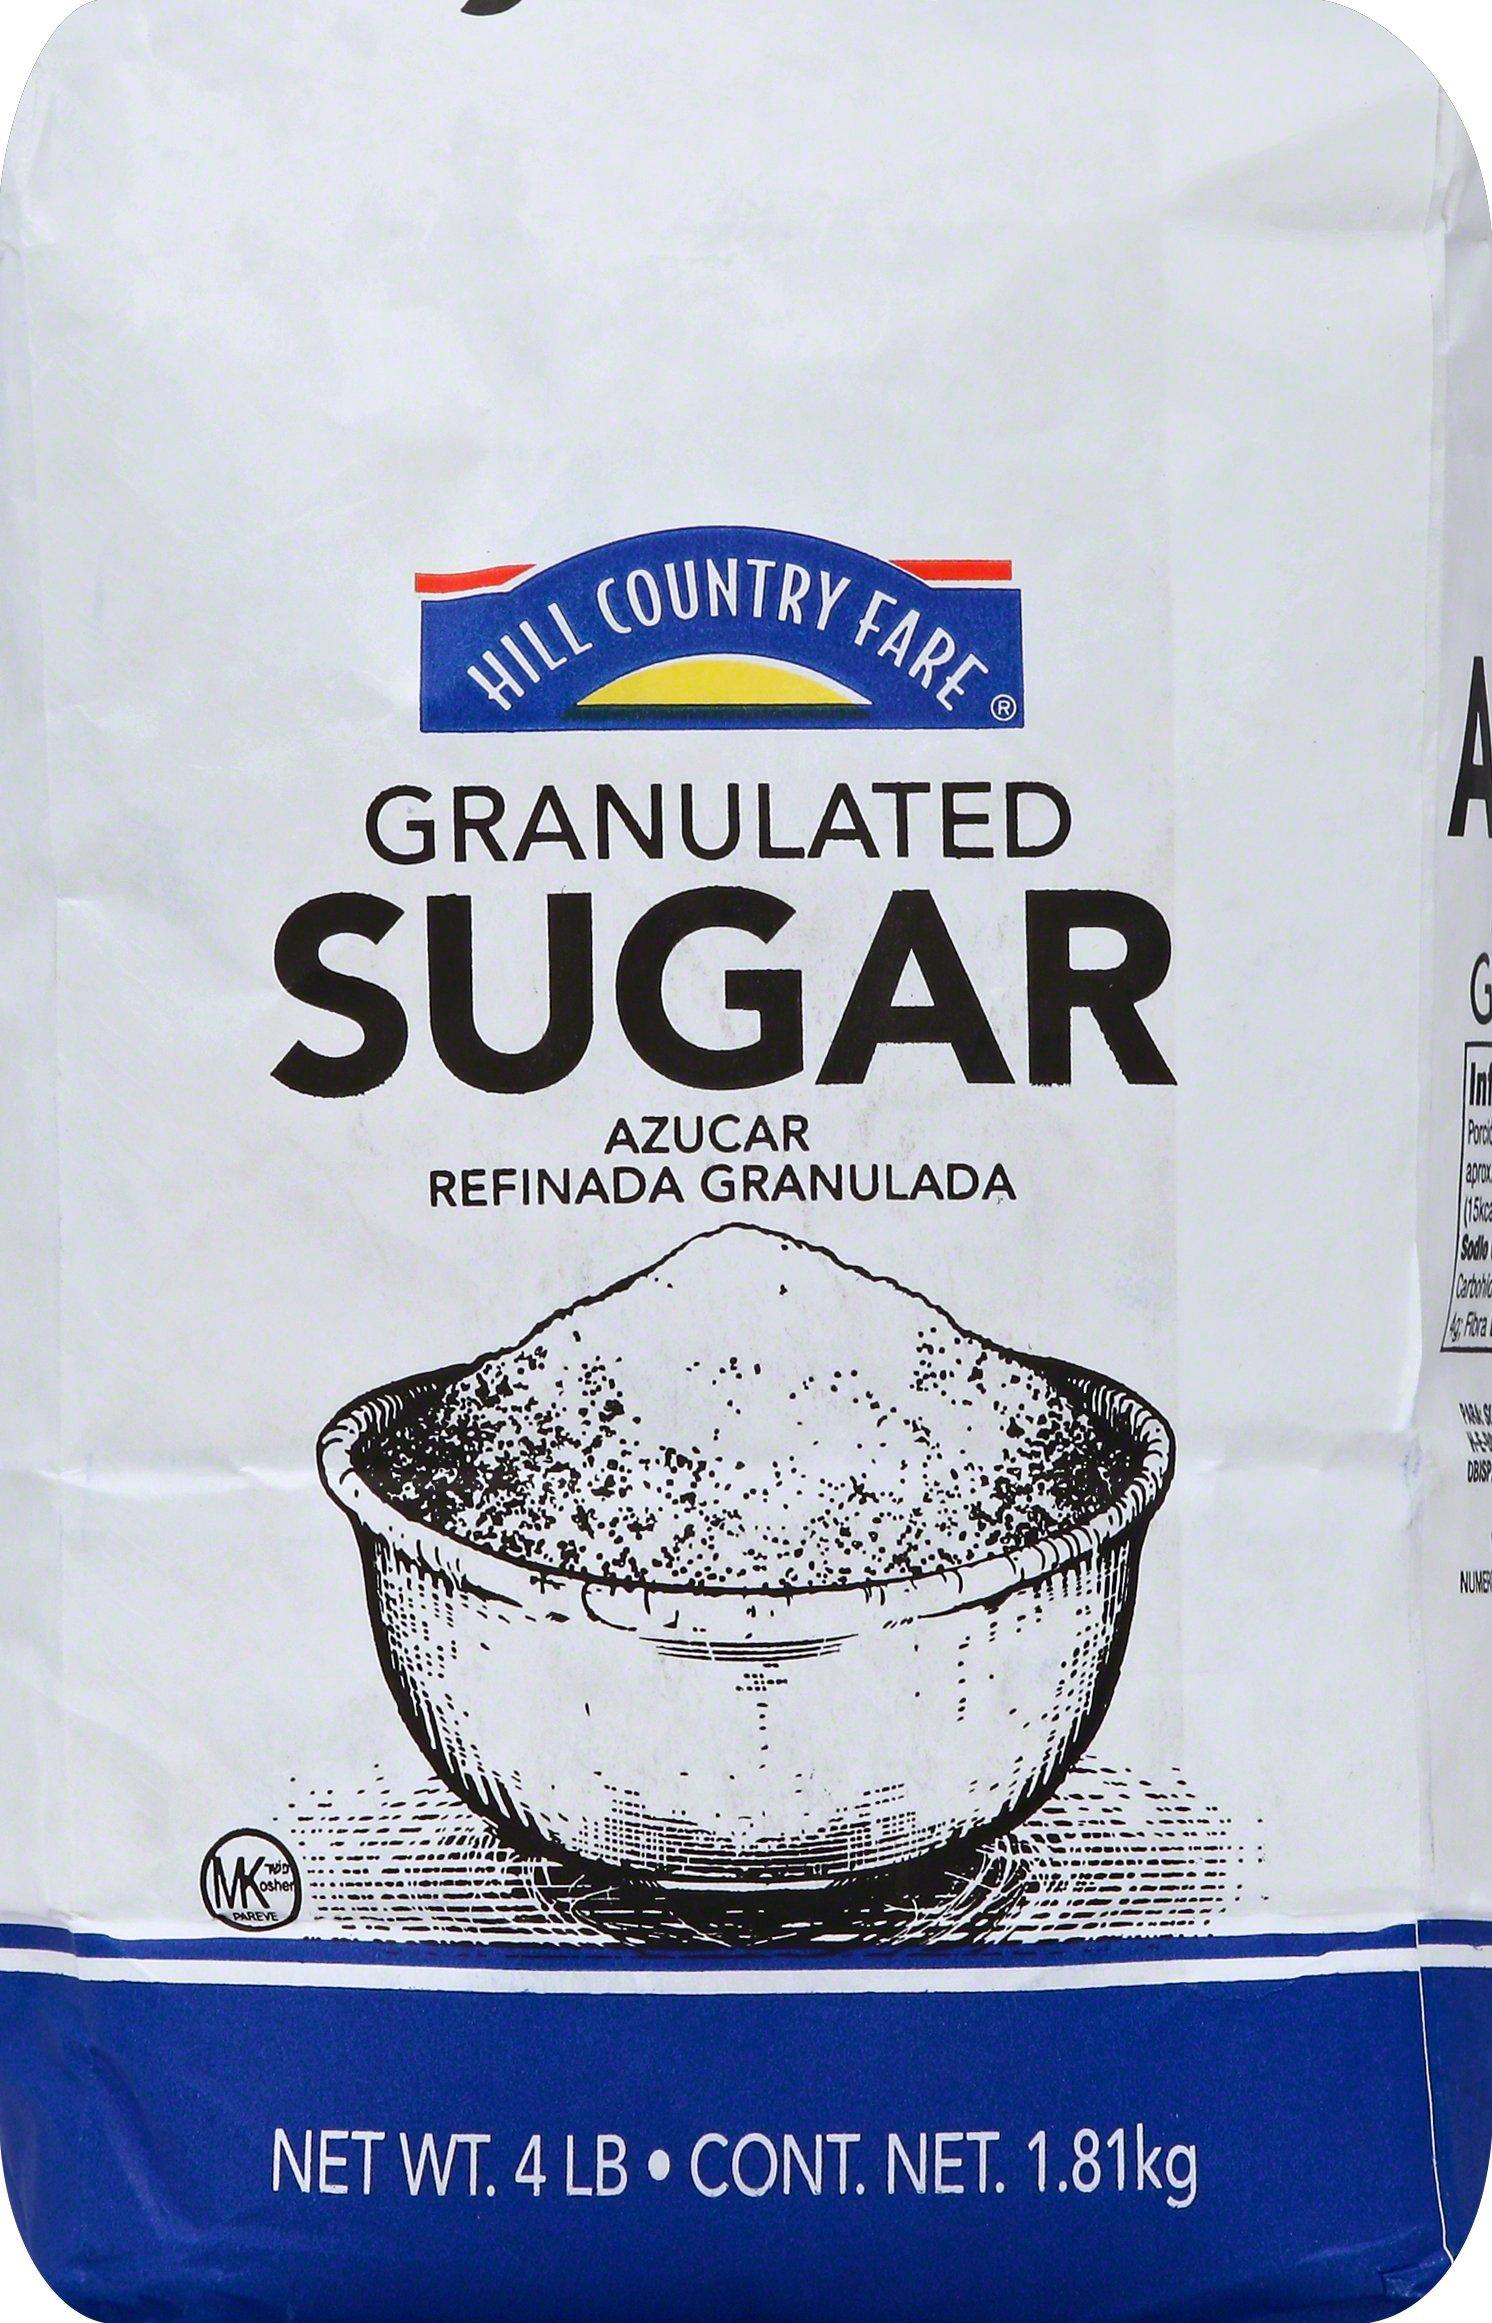 Sugar ‑ Shop H‑E‑B Everyday Low Prices